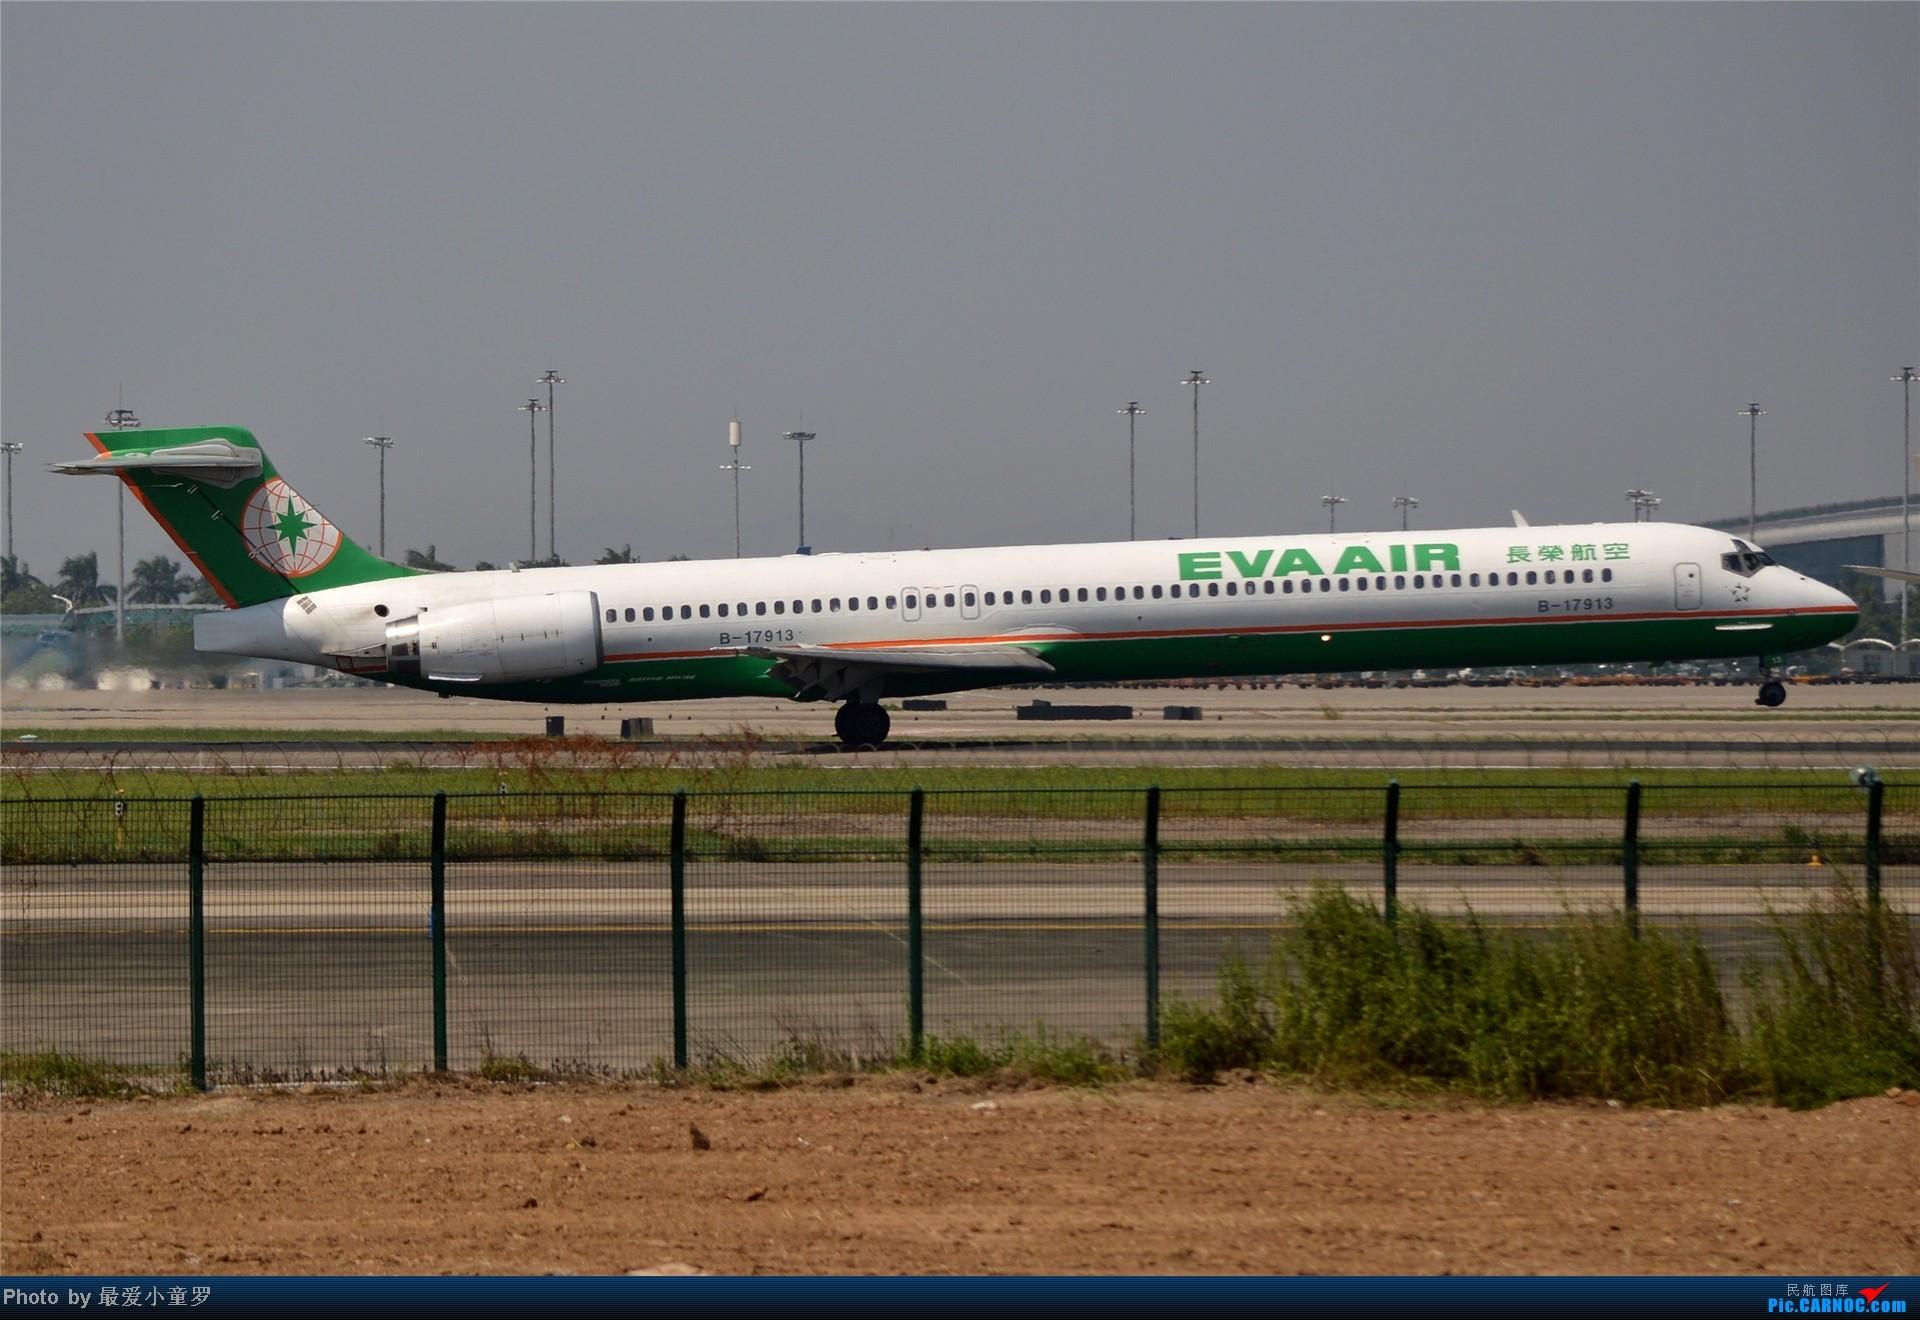 Re:[原创]炒冷饭贴之13年10月2日CAN拍机杂图系列 MCDONNELL DOUGLAS MD-90-30 B-17913 中国广州白云机场